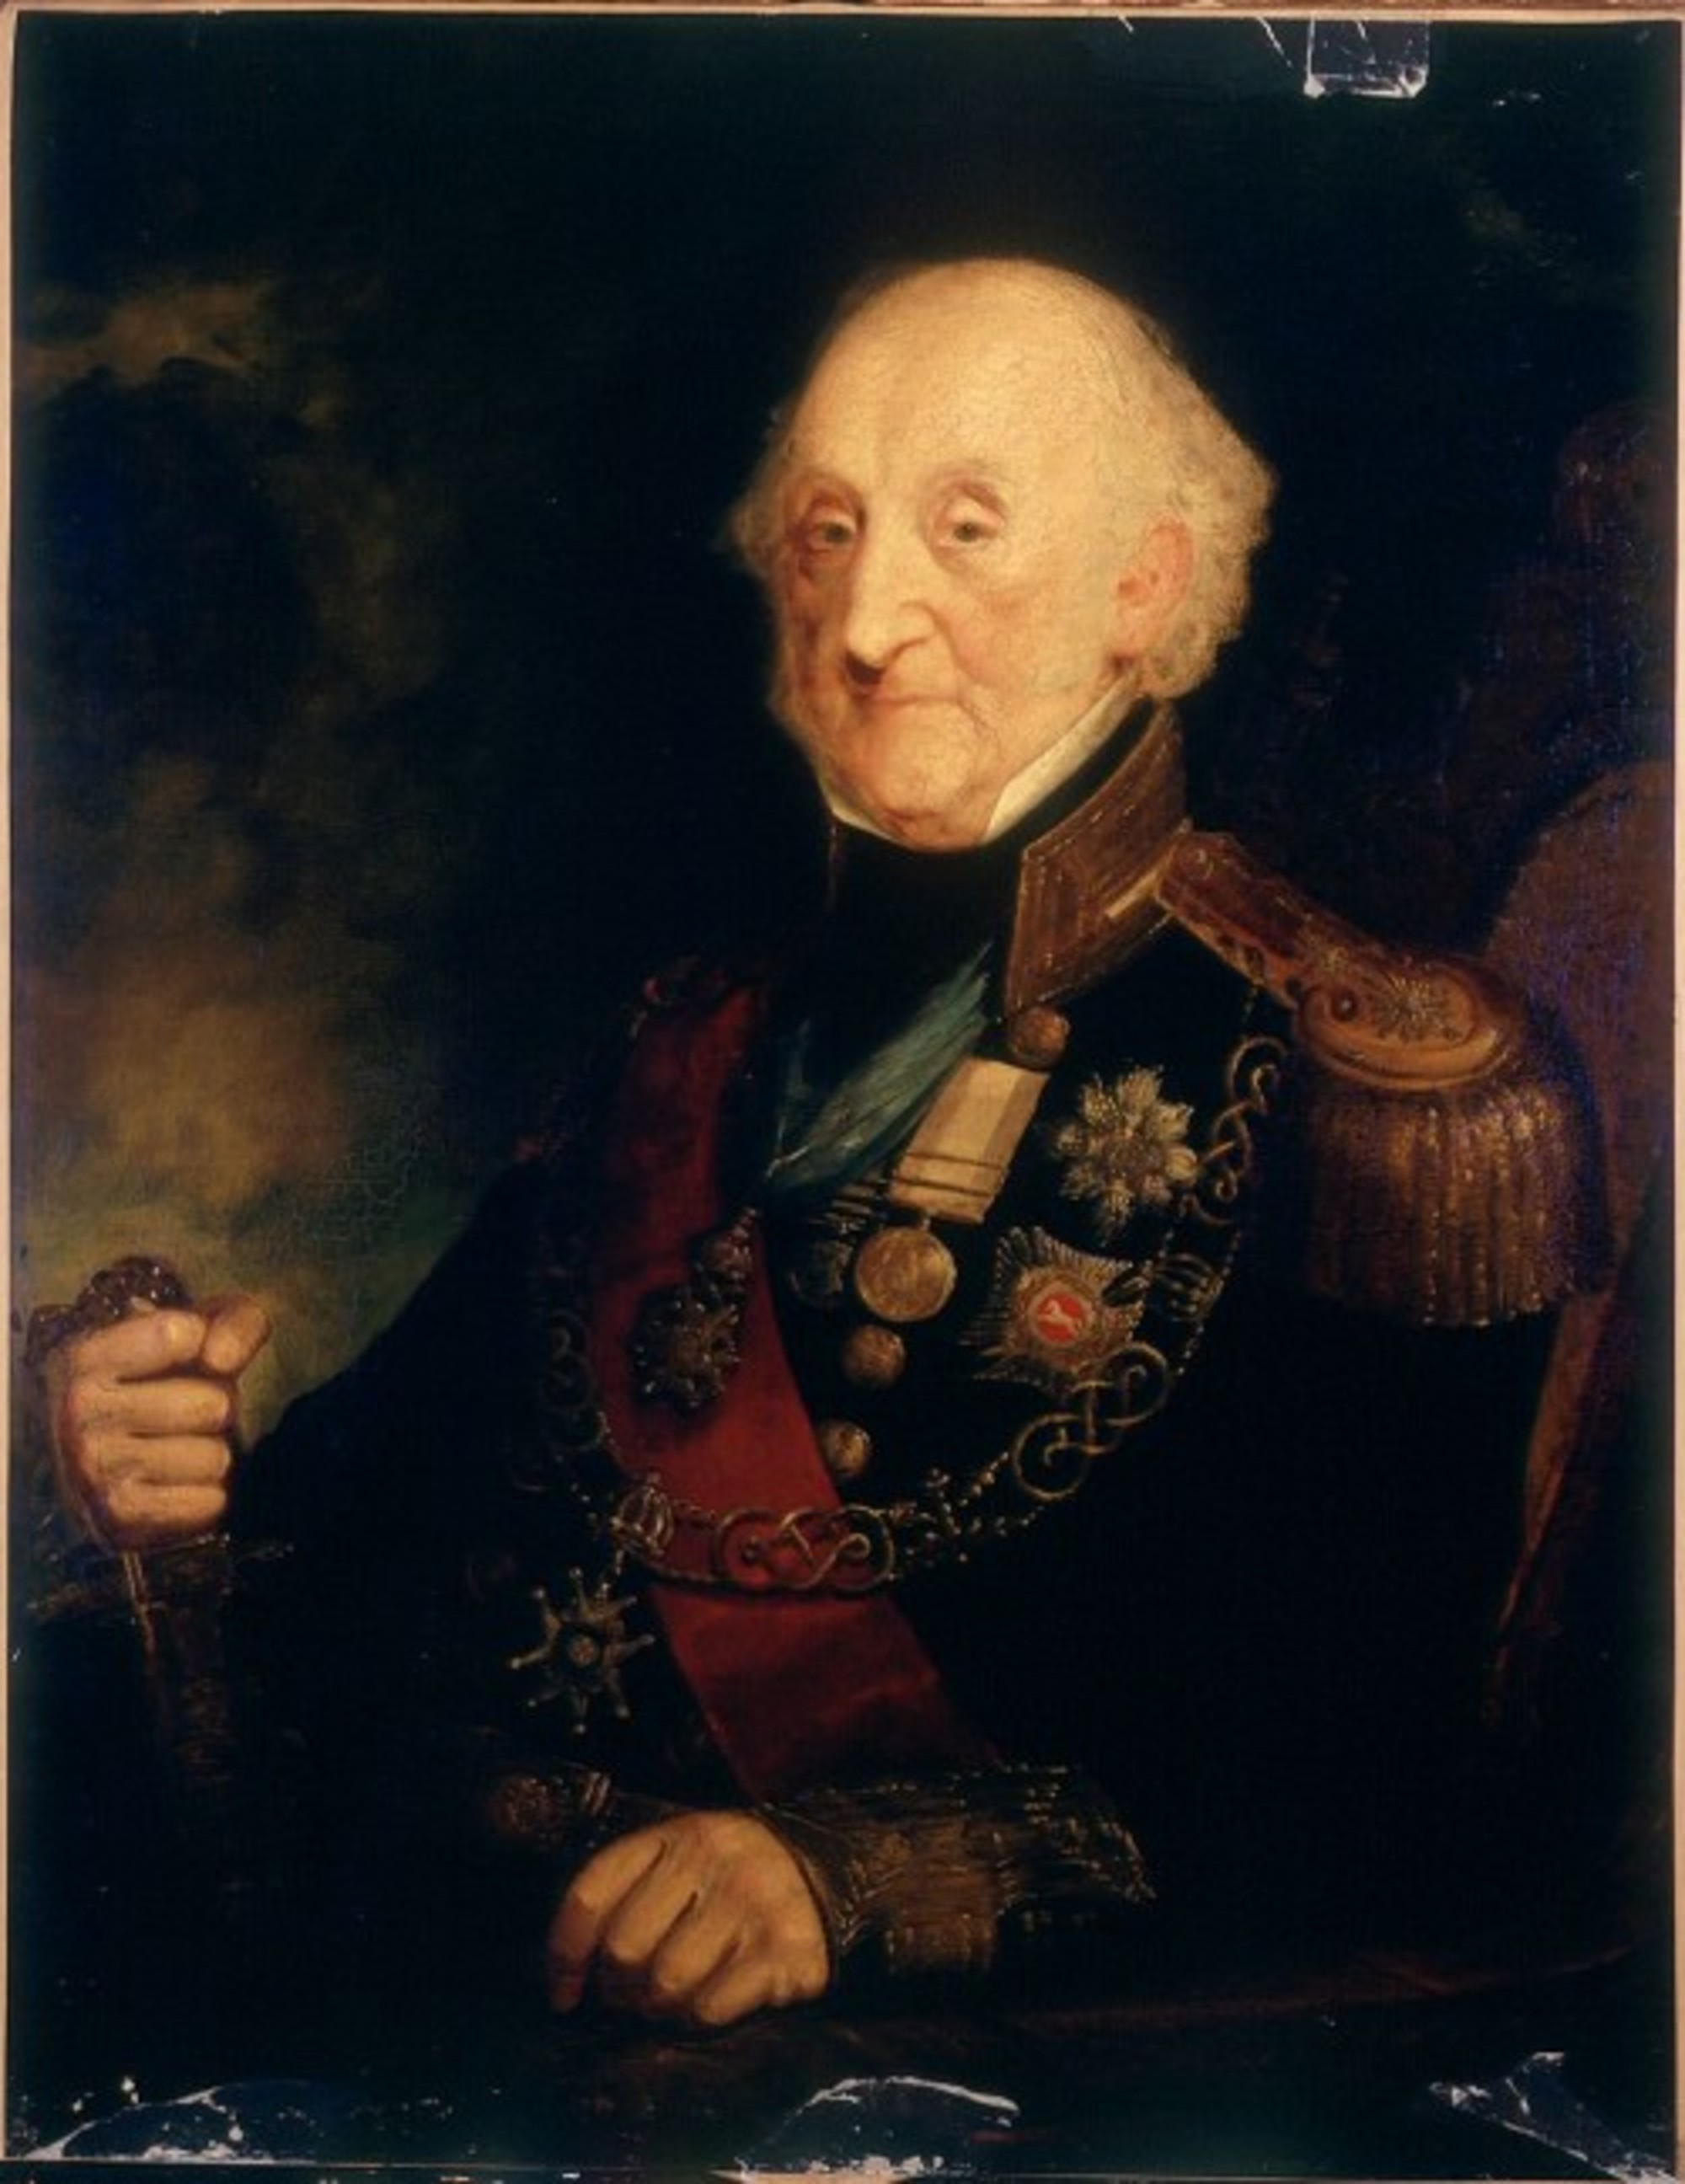 Vice-Admiral-Sir-Charles-Bullen-1769-1853-RMG-BHC2584.jpg